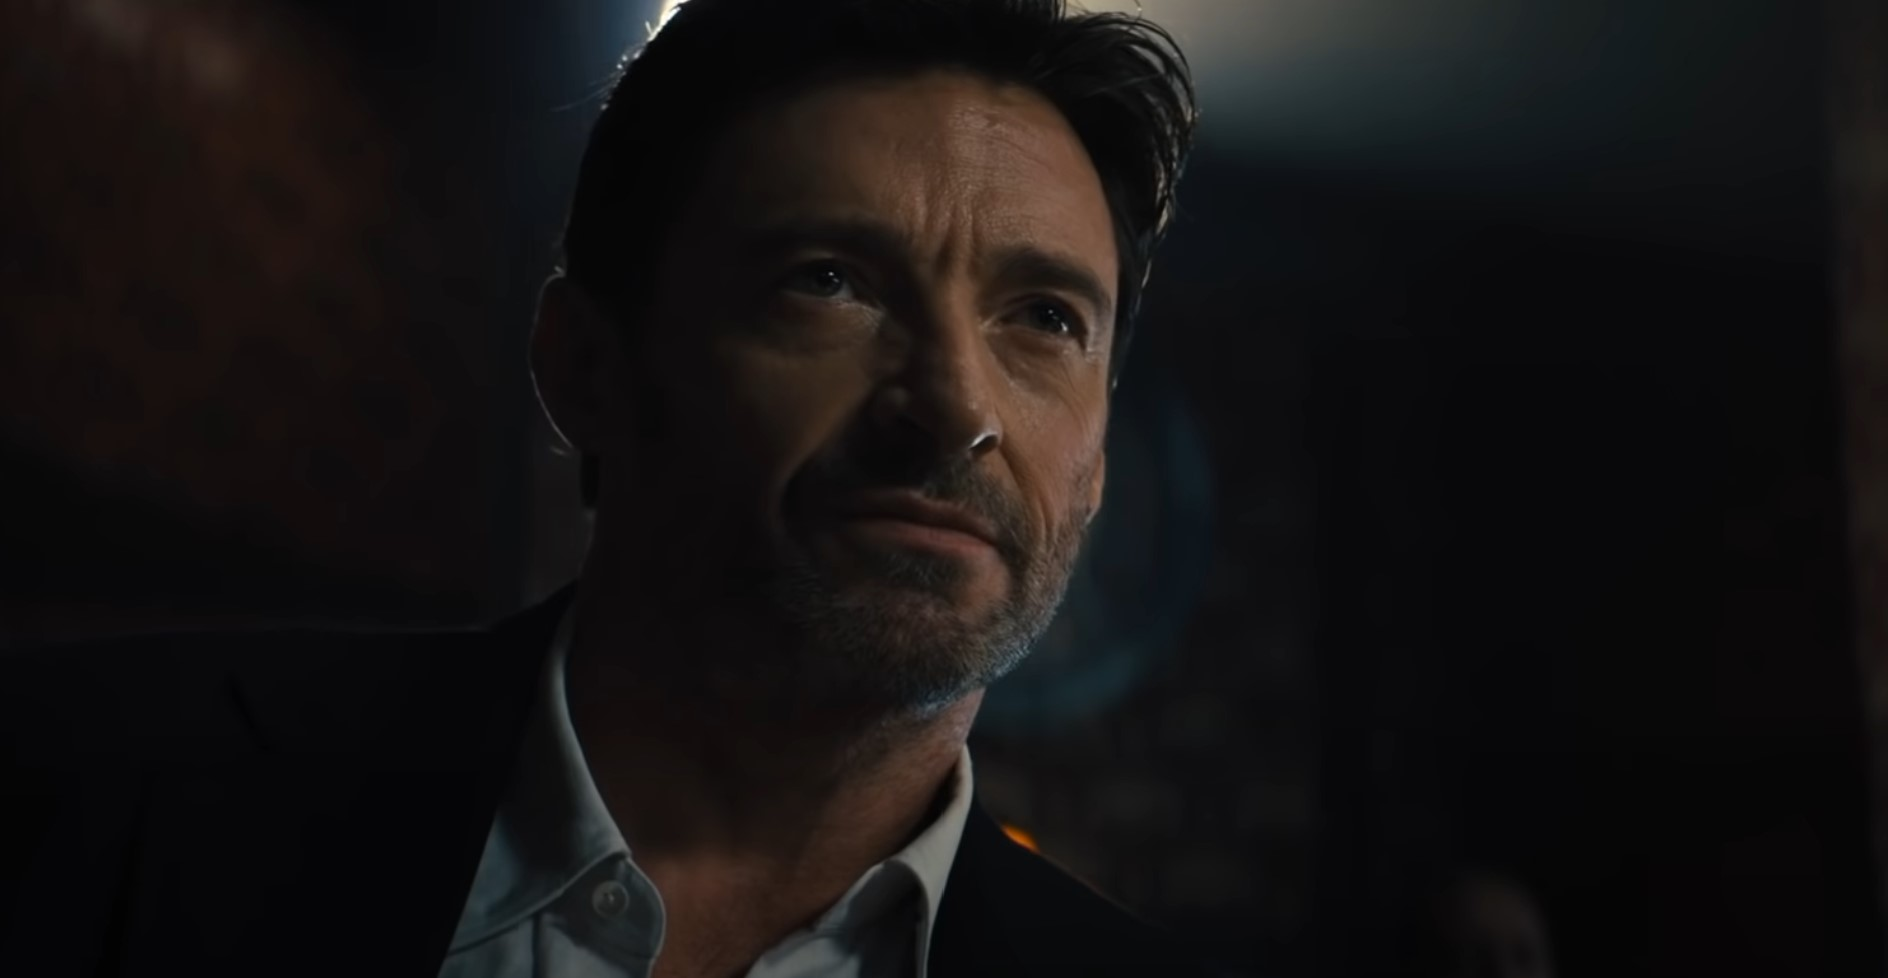 Hugh Jackman to Return as Wolverine to Marvel Cinematic Universe?